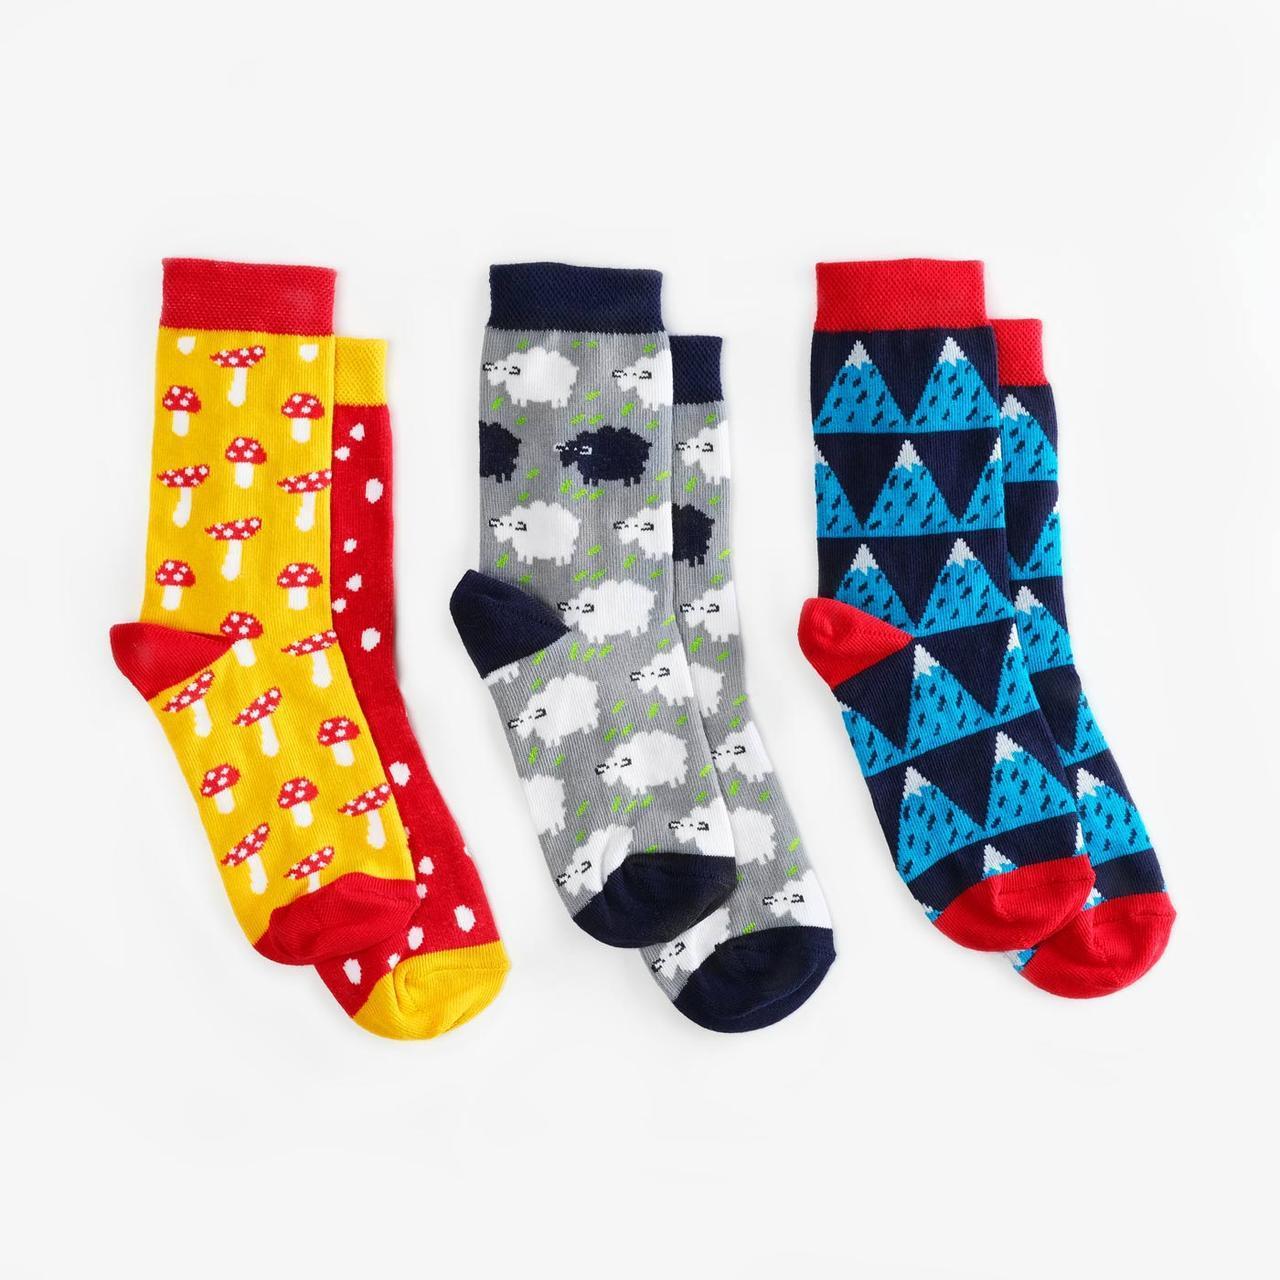 Носки детские Dodo Socks набор Yukon 4-6 лет